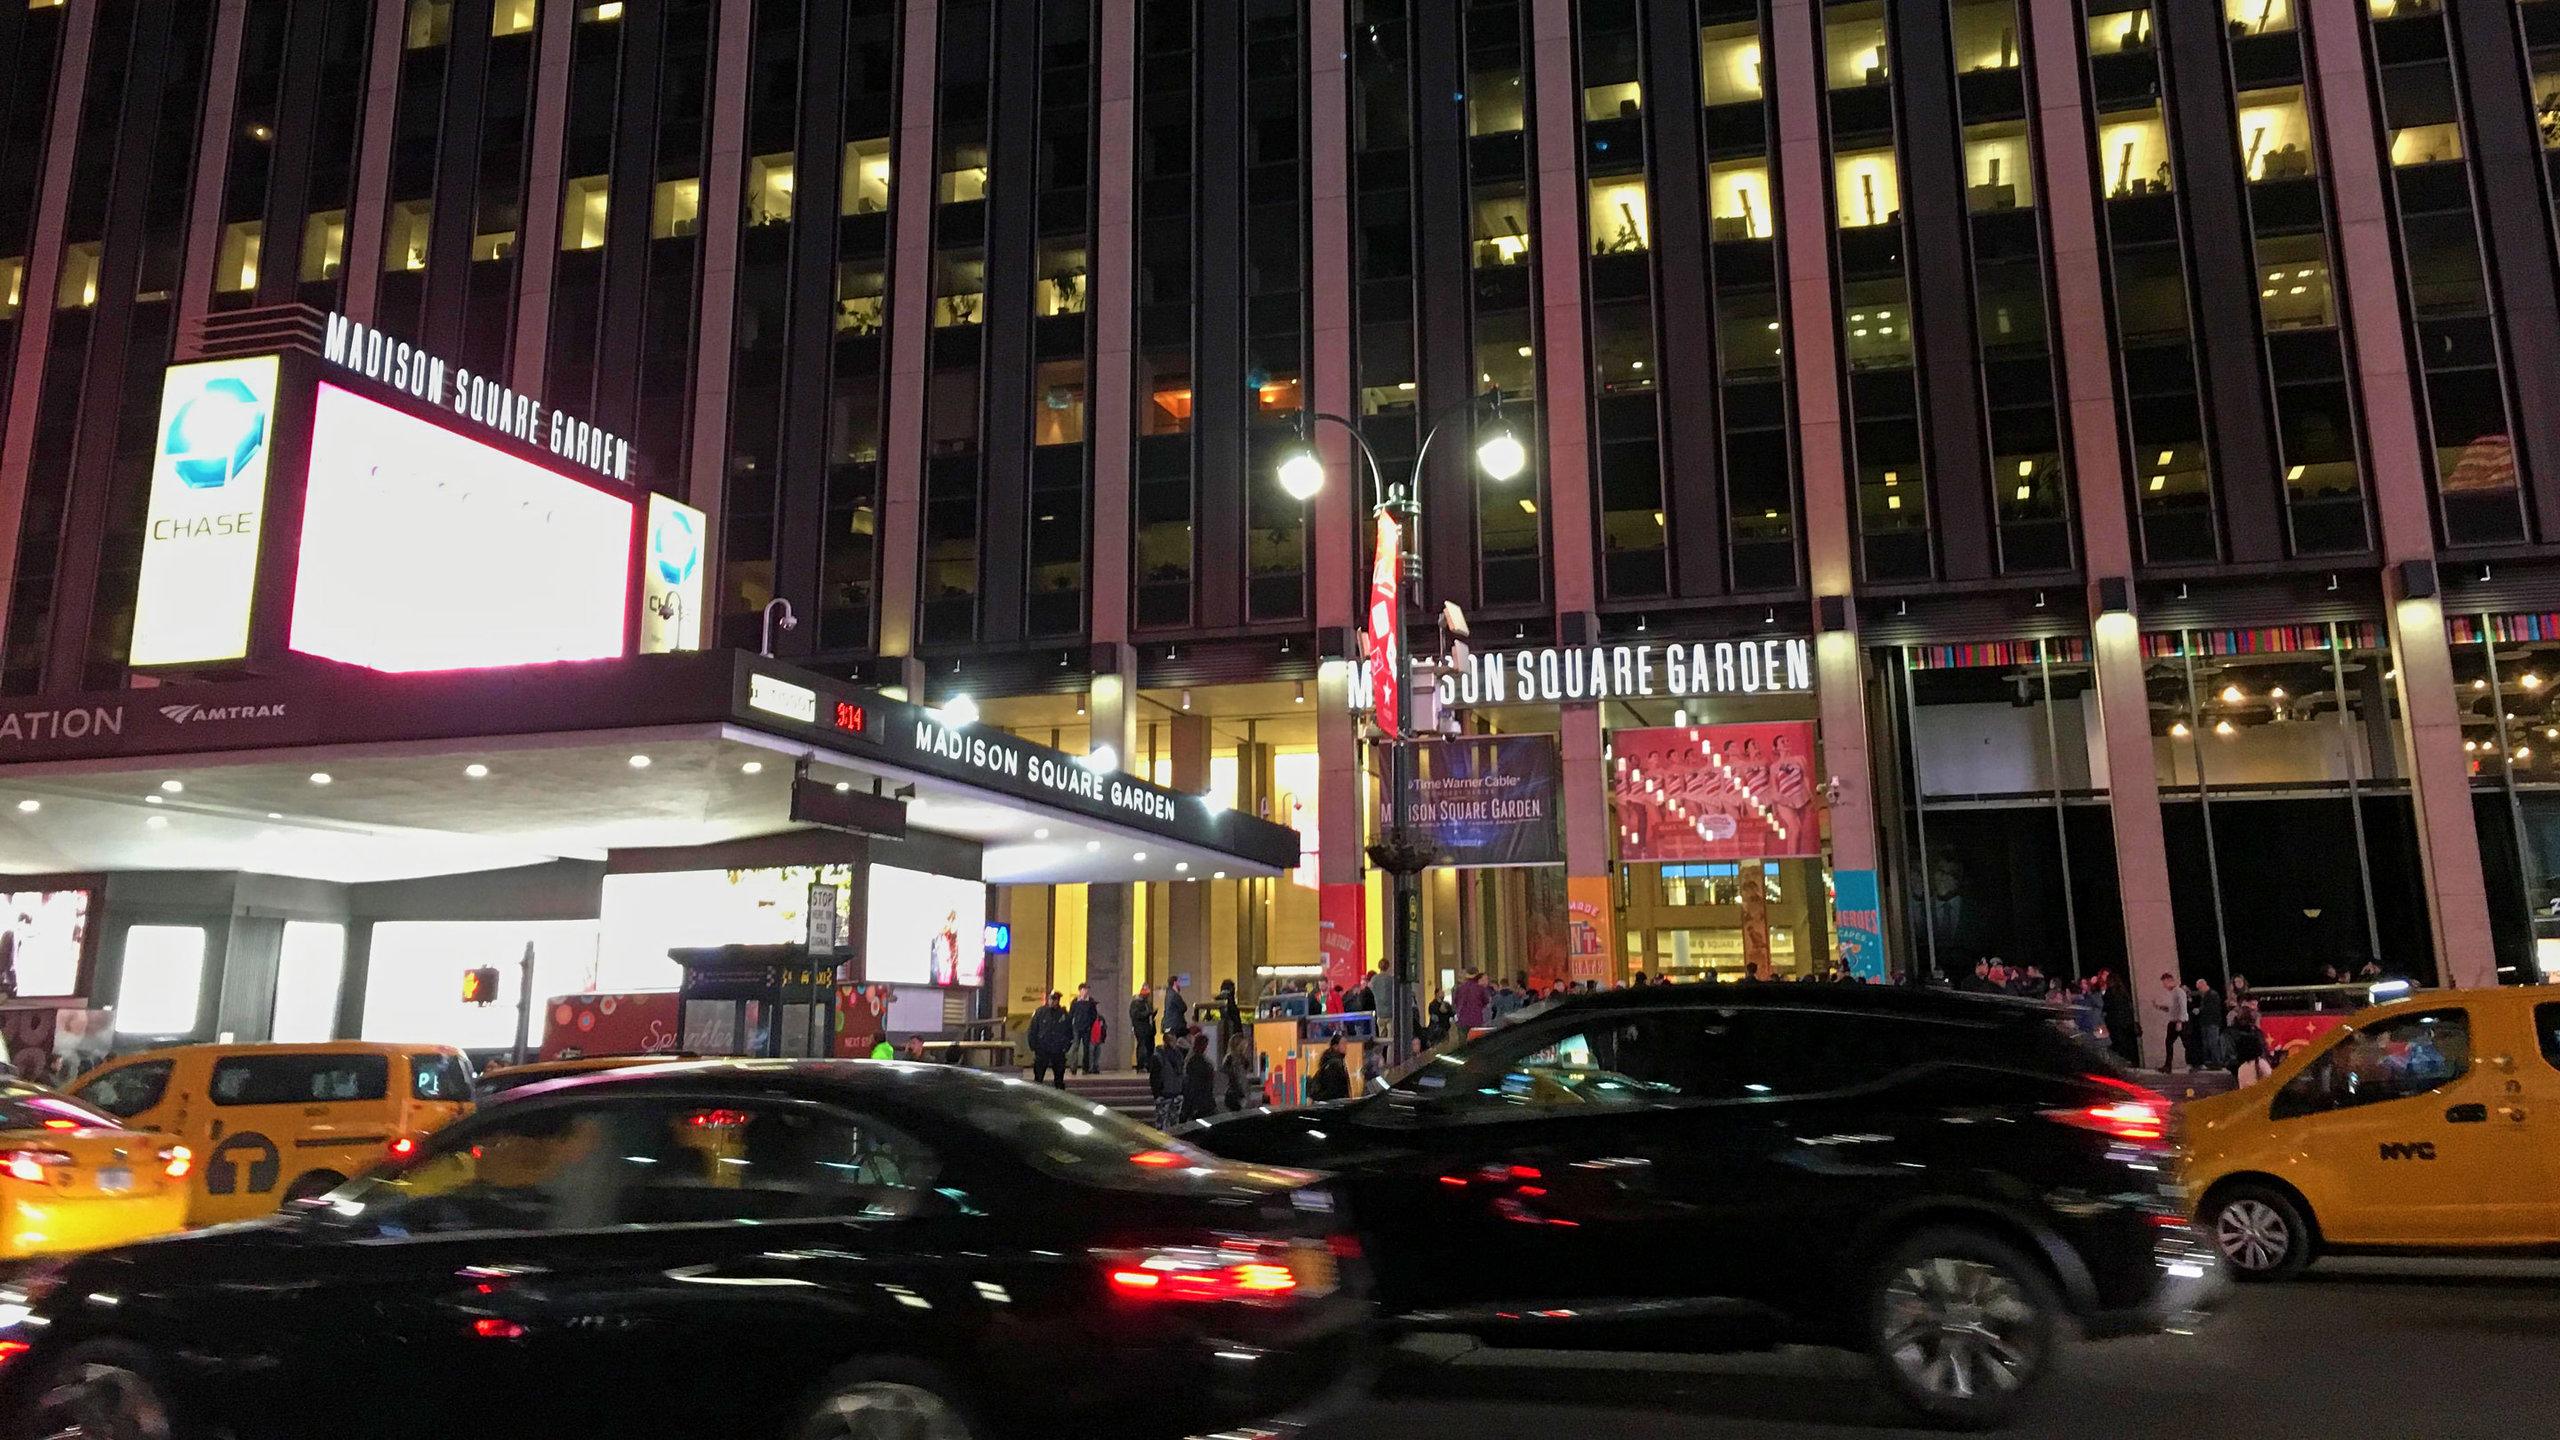 Hotels Nahe Madison Square Garden New York Hotels Expedia De